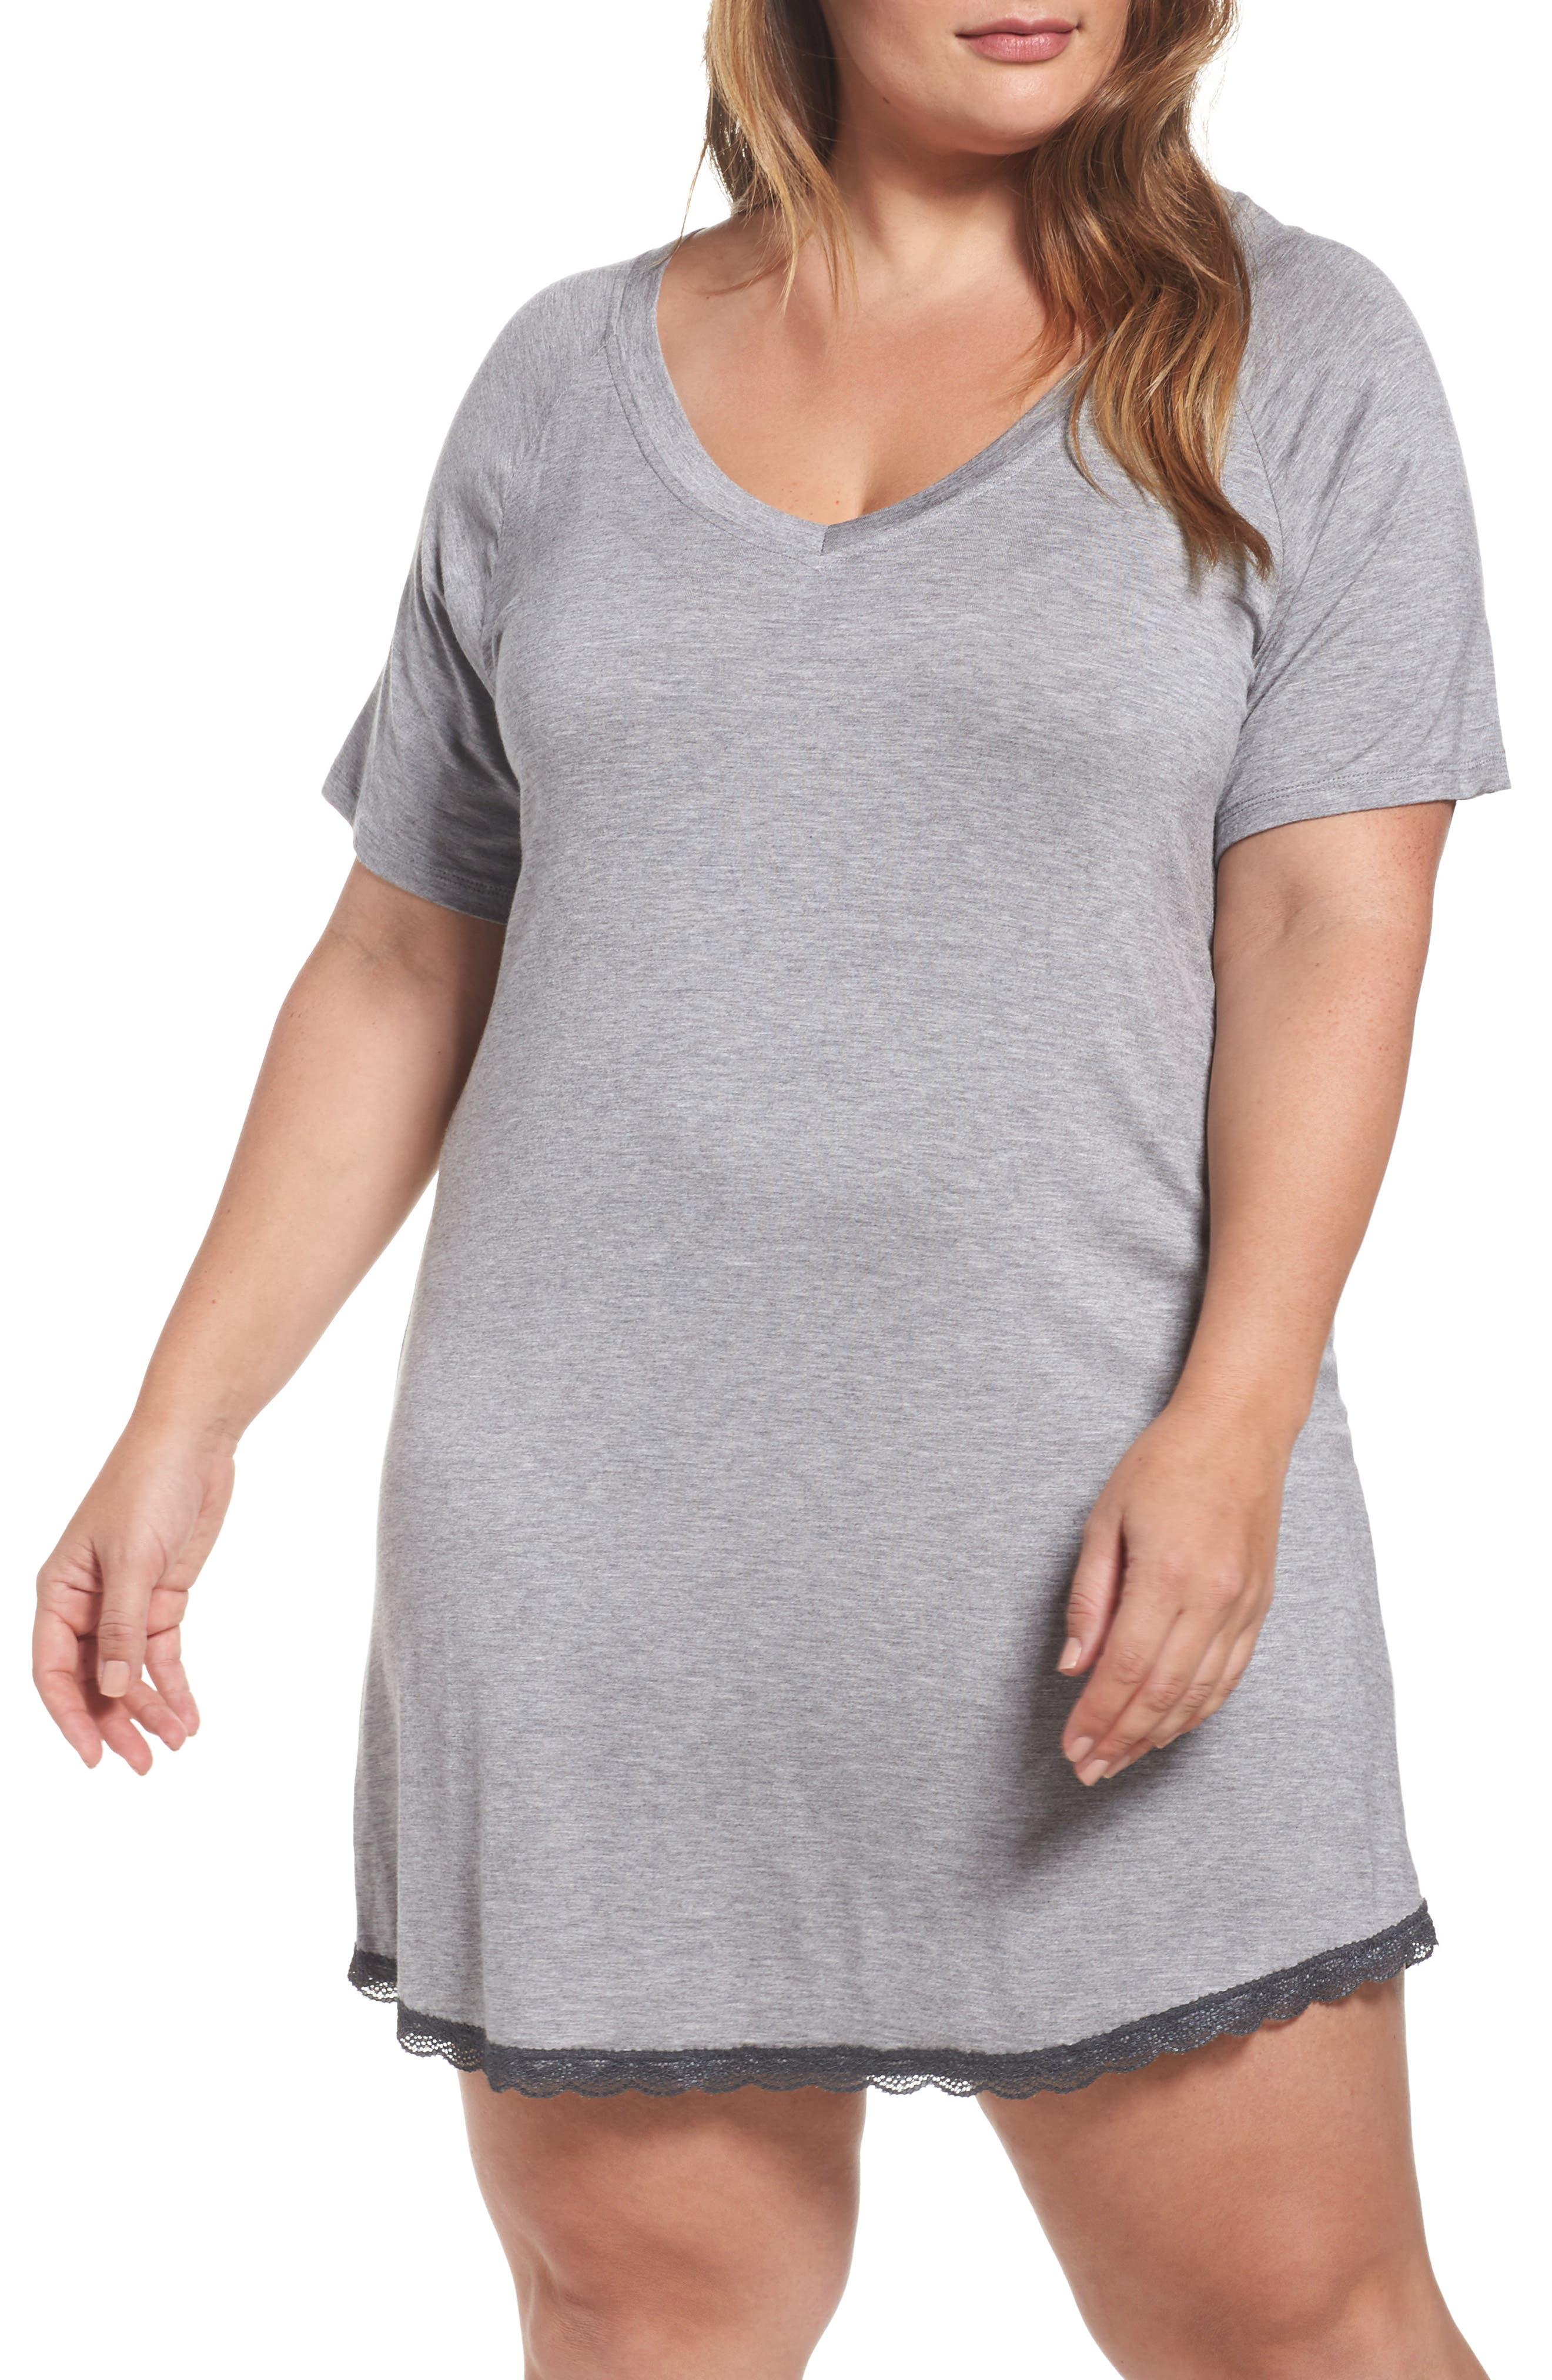 Honeydew Lace Trim Sleep Shirt,                         Main,                         color, Heather Grey